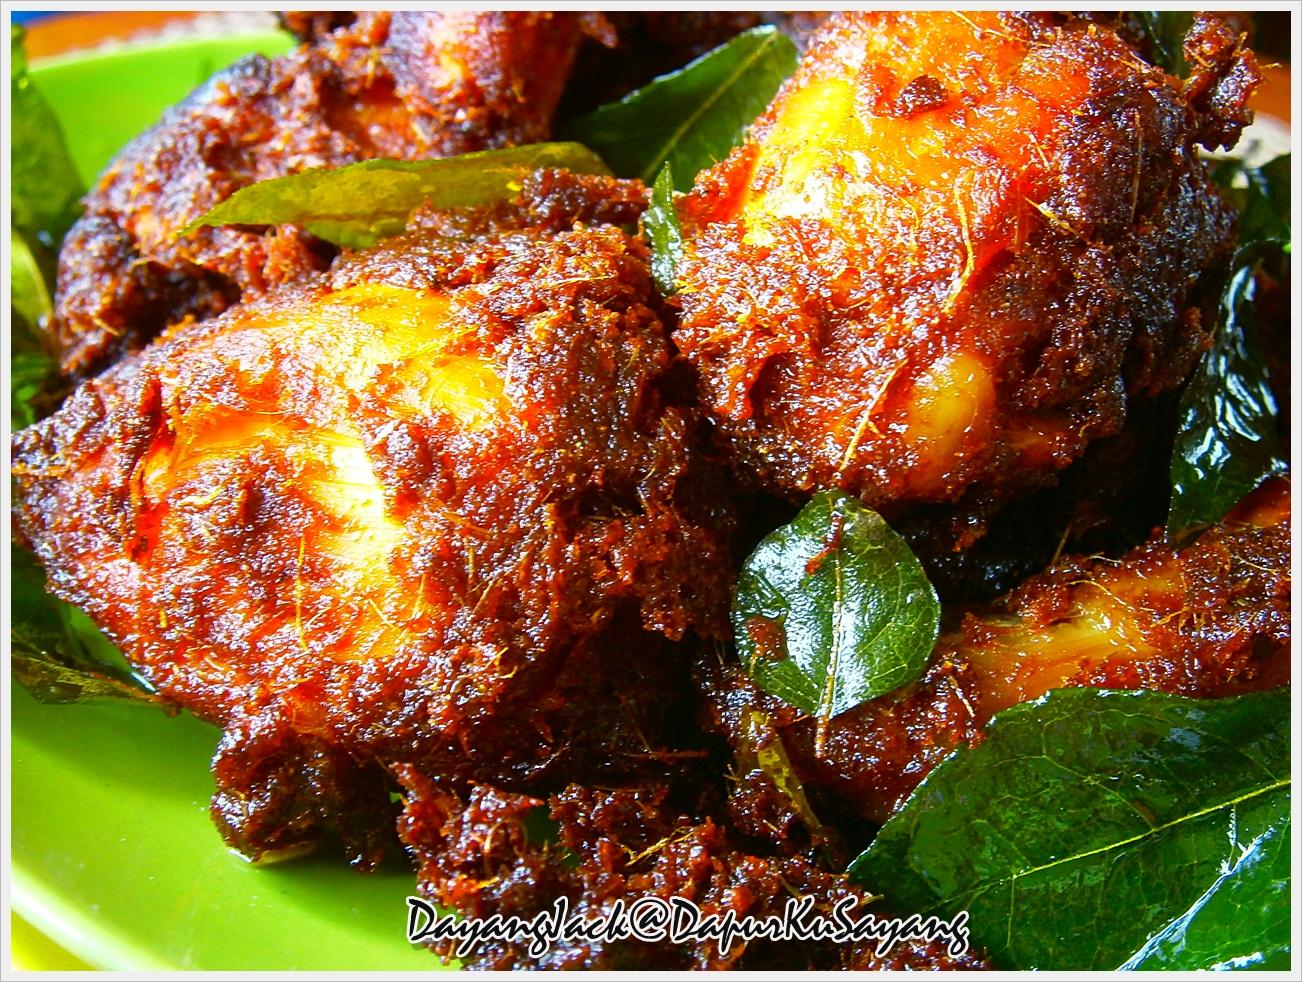 DapurKu SaYang: Ayam Goreng Berempah Beriani (resepi II)